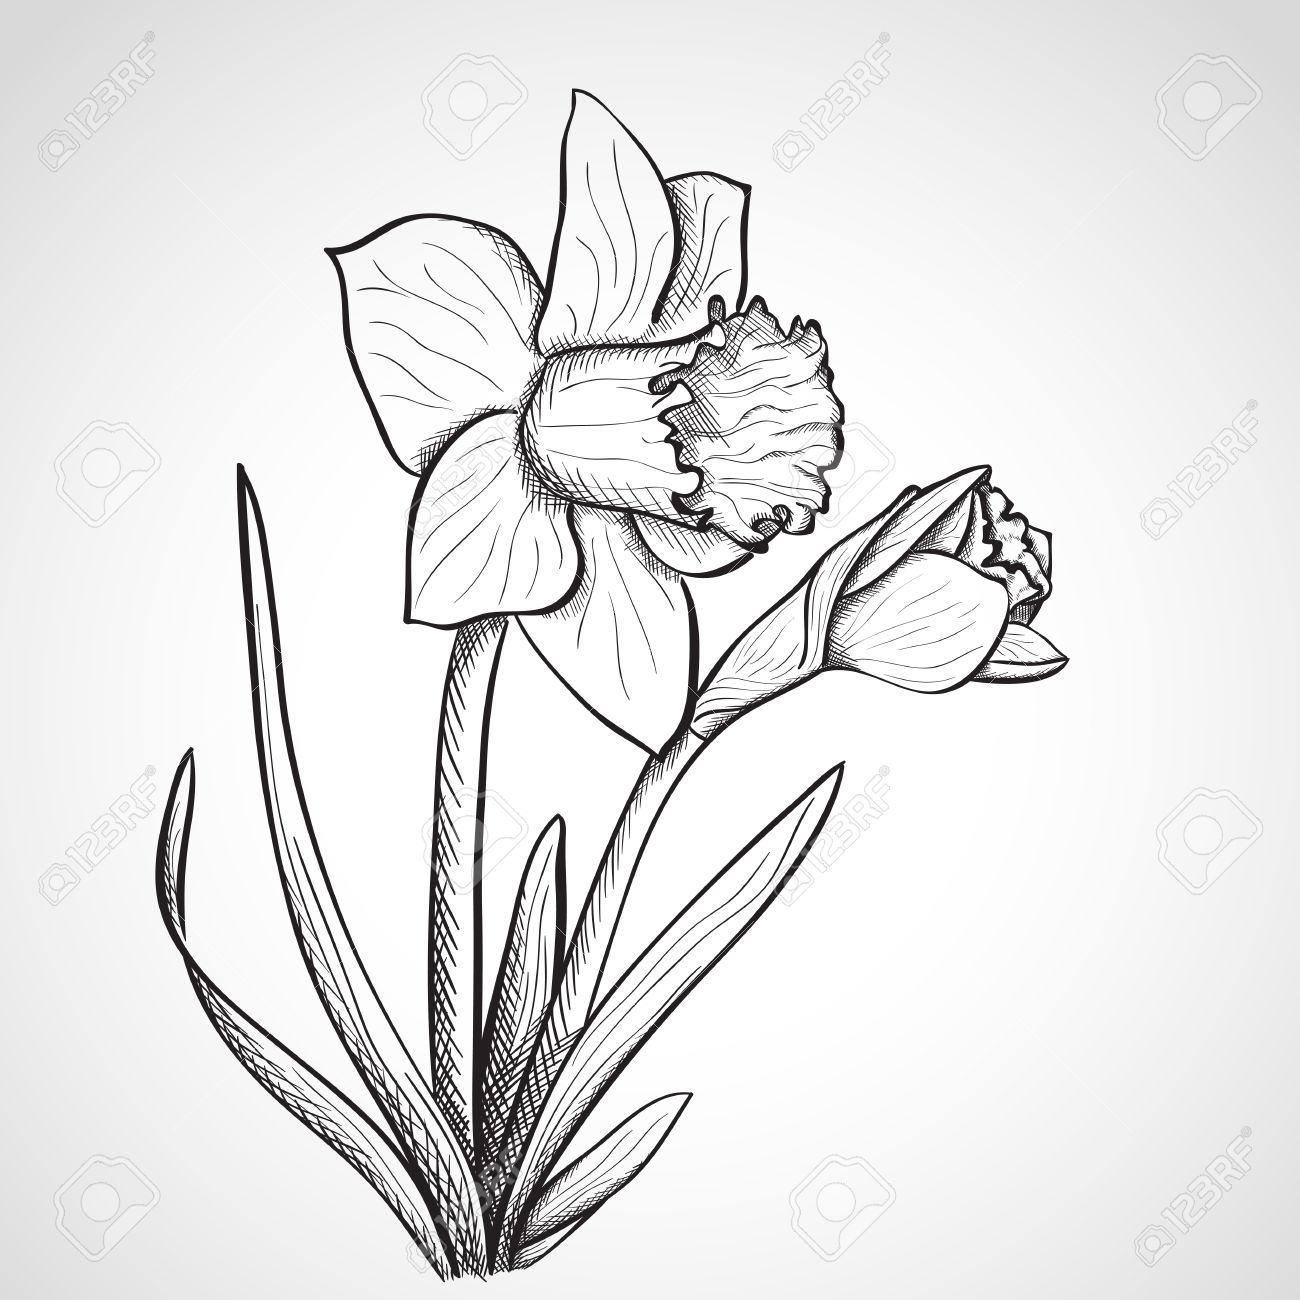 1300x1300 28437054 Sketch Daffodil Hand Drawn Ink Style Stock Photo.jpg